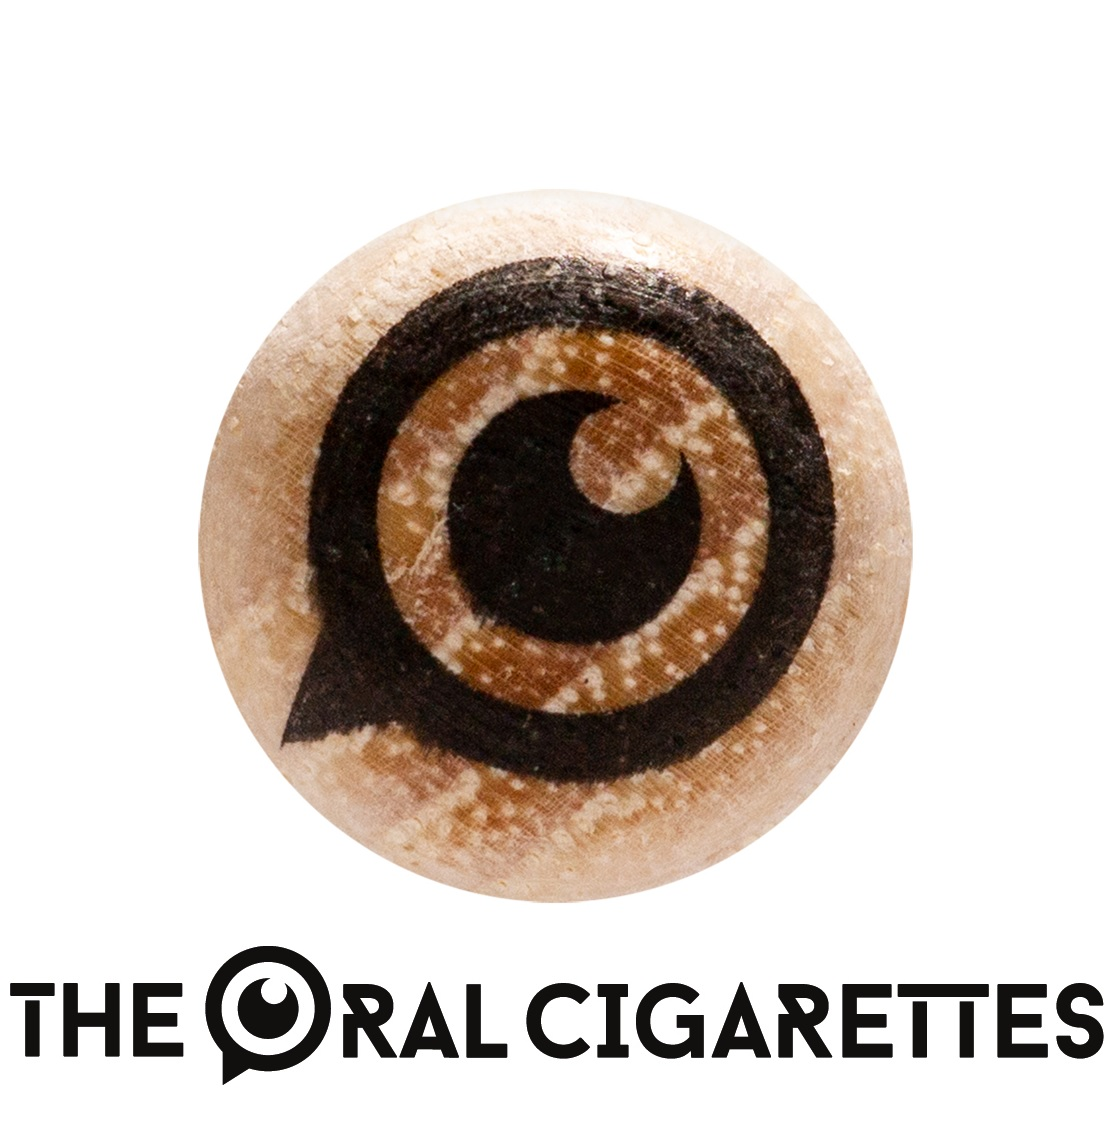 theoralcigarettes w-mnsエンド